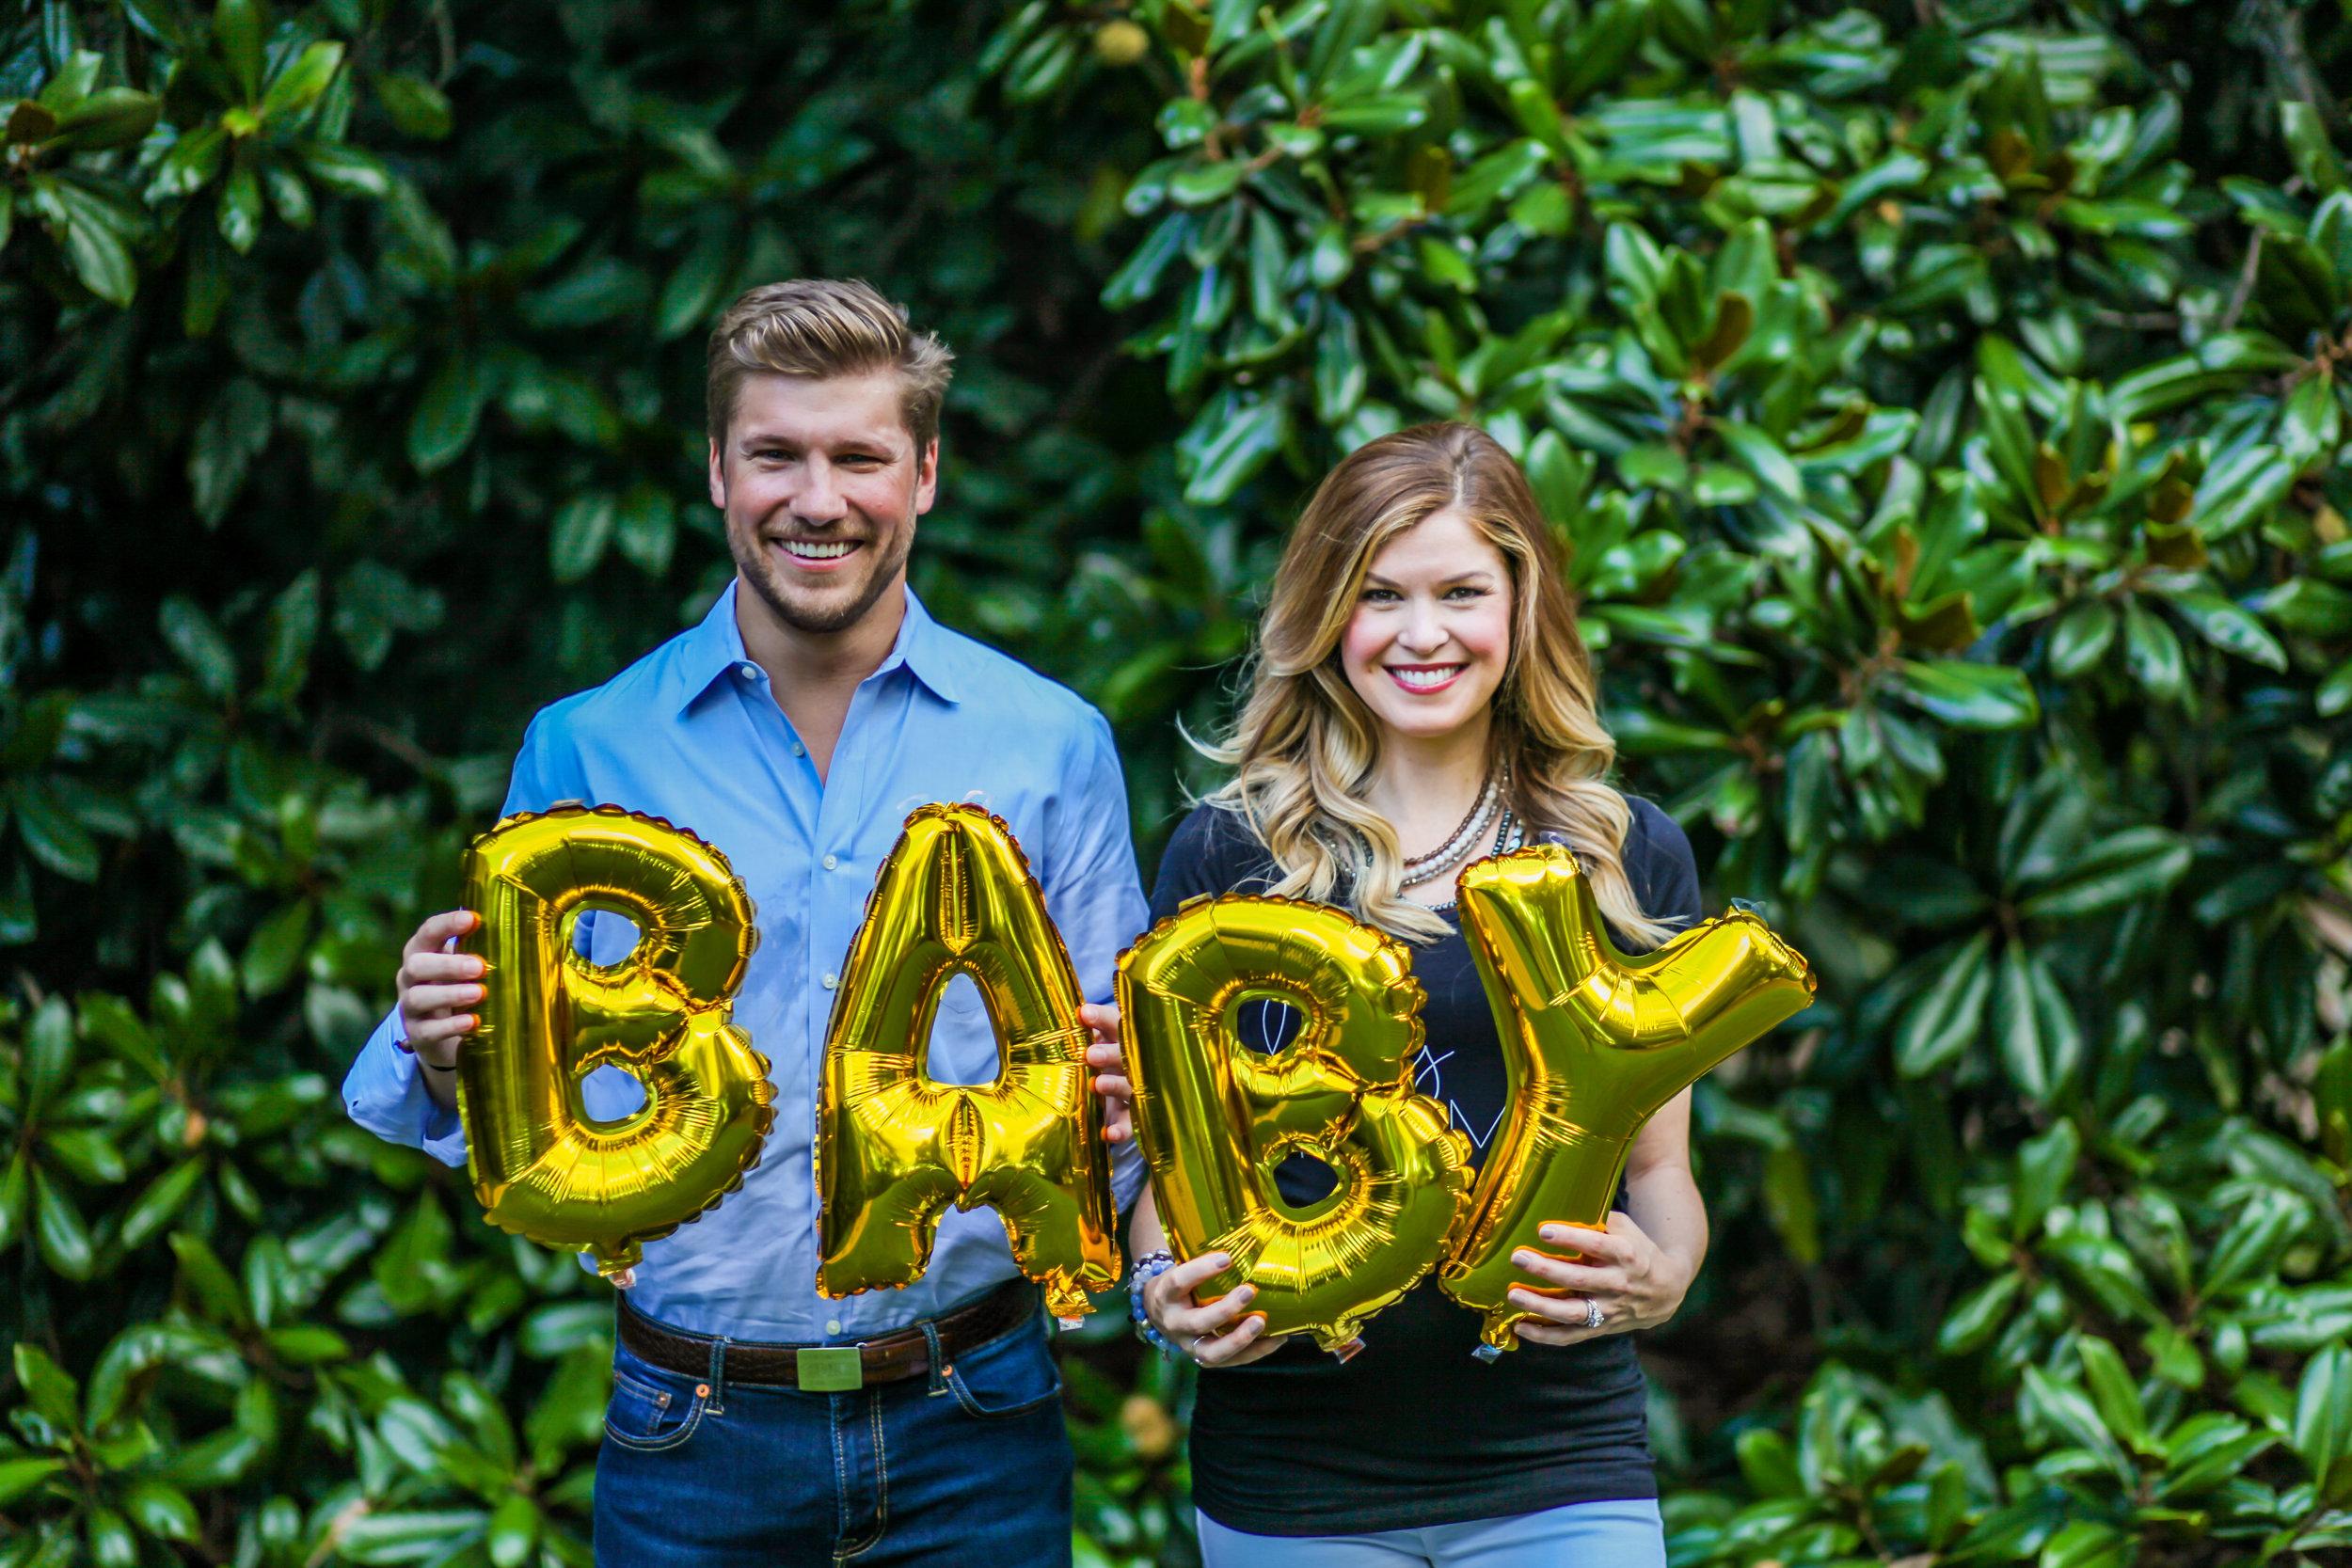 atlanta pregnancy announcement